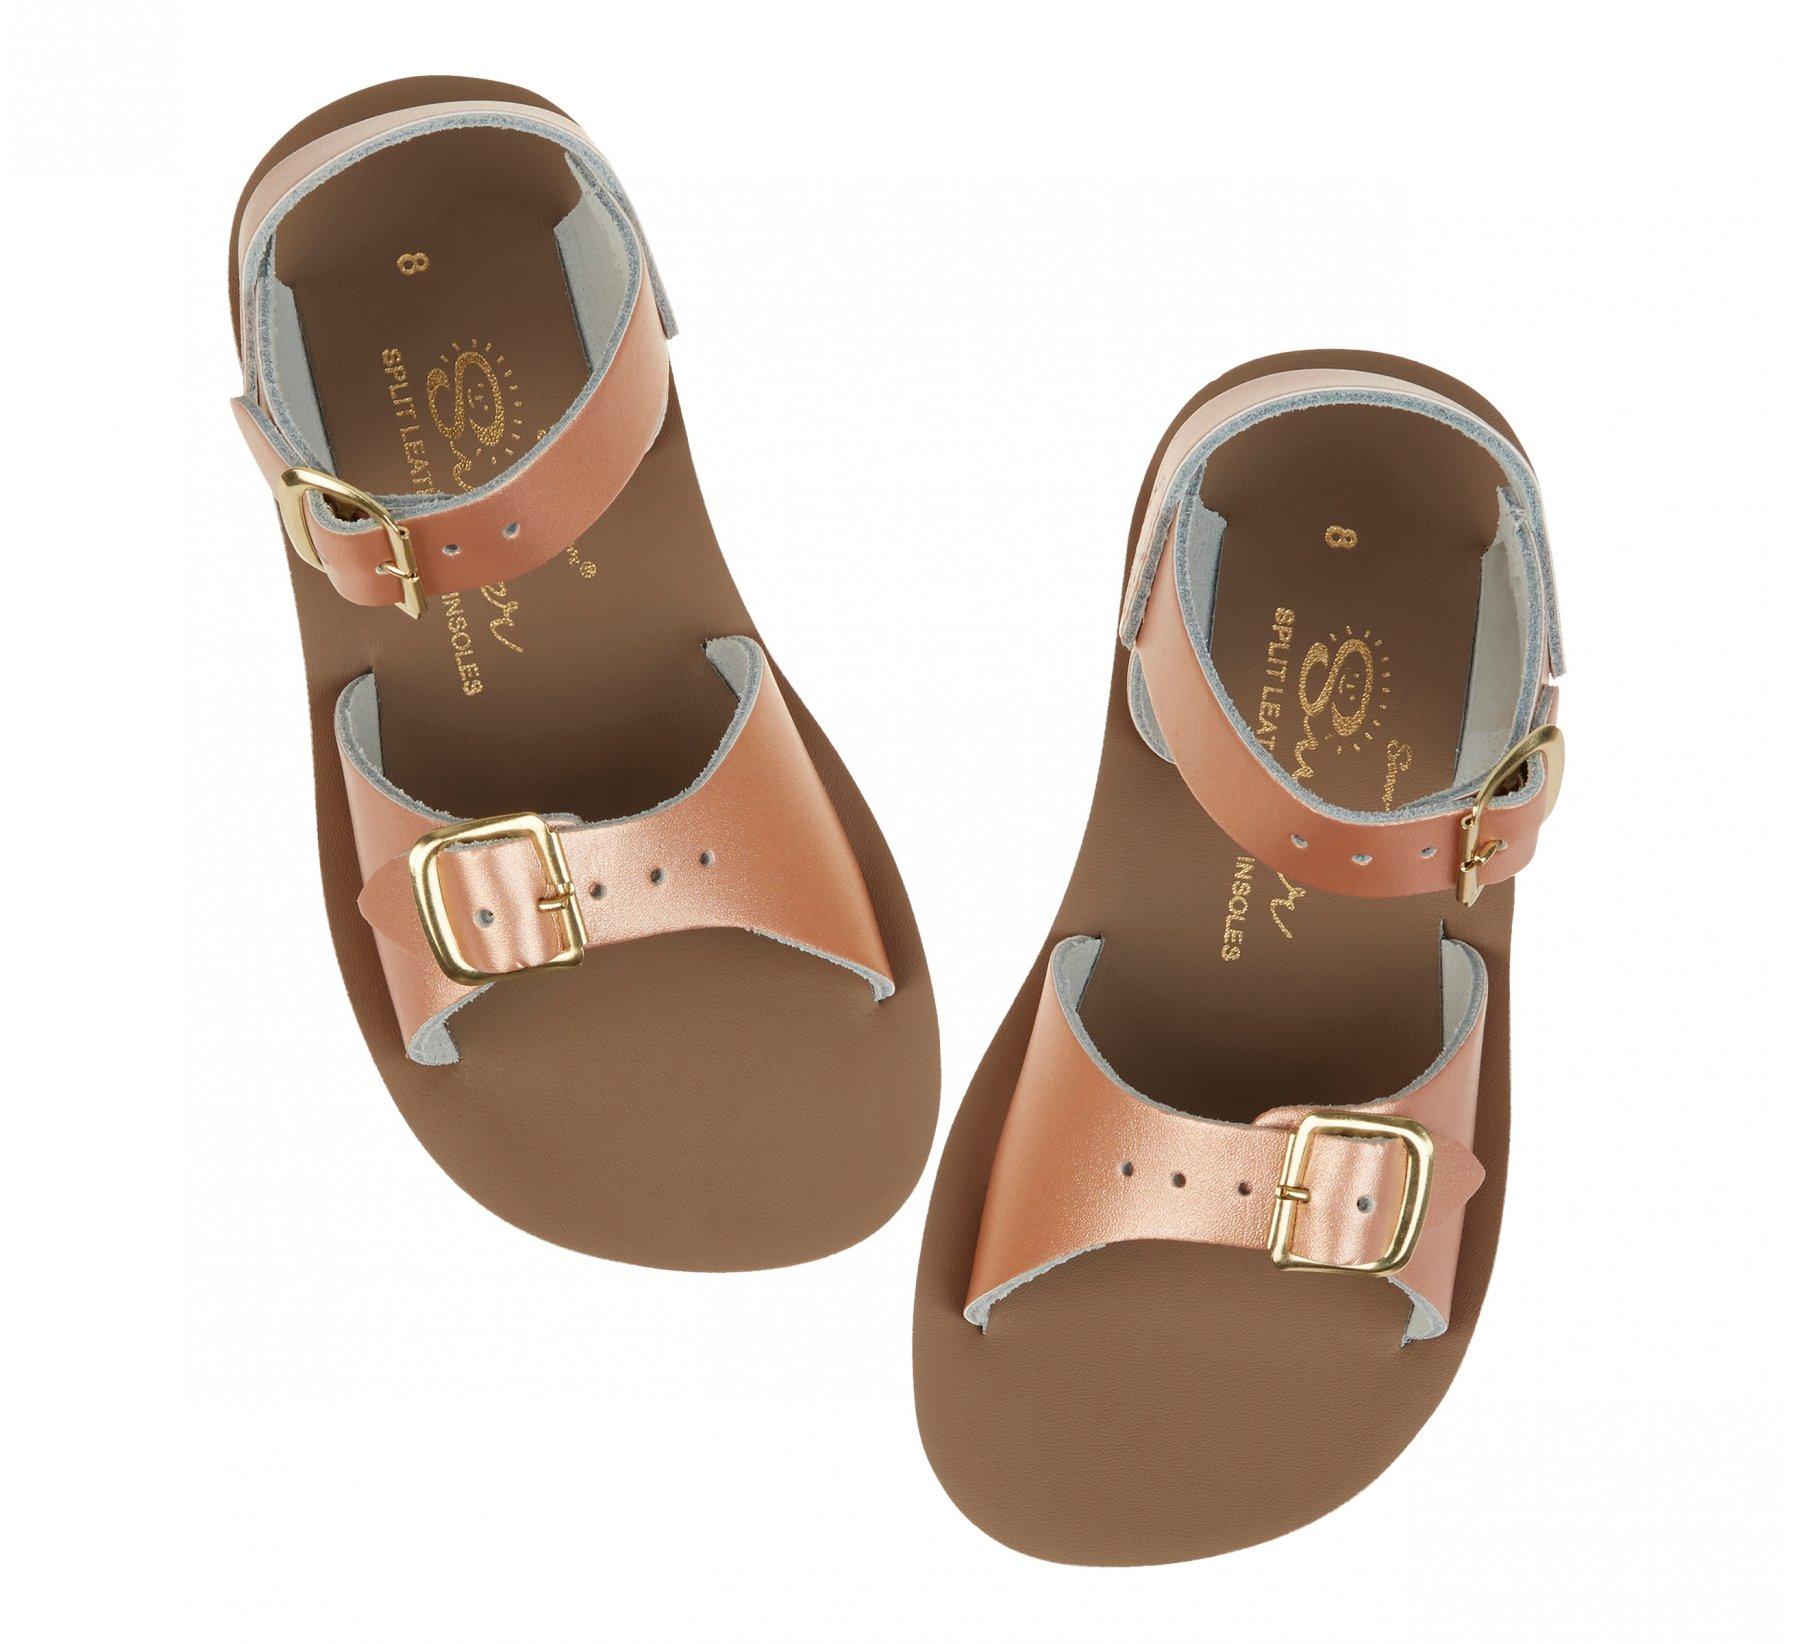 Surfer Emas Ros Merah - Salt Water Sandals